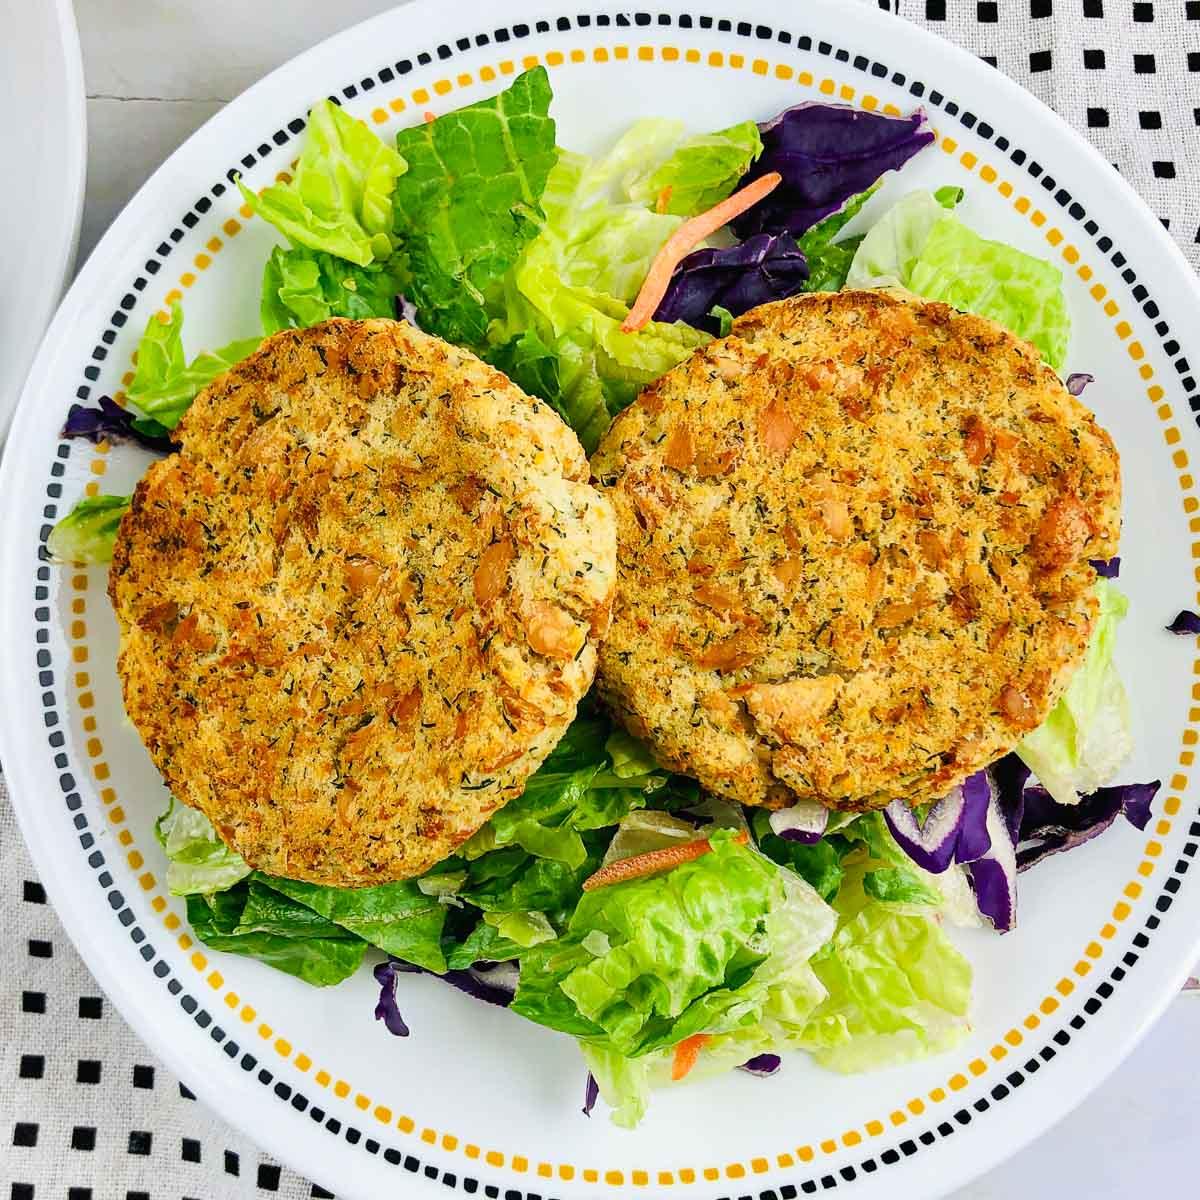 Two salmon potato patties over salad on a plate.